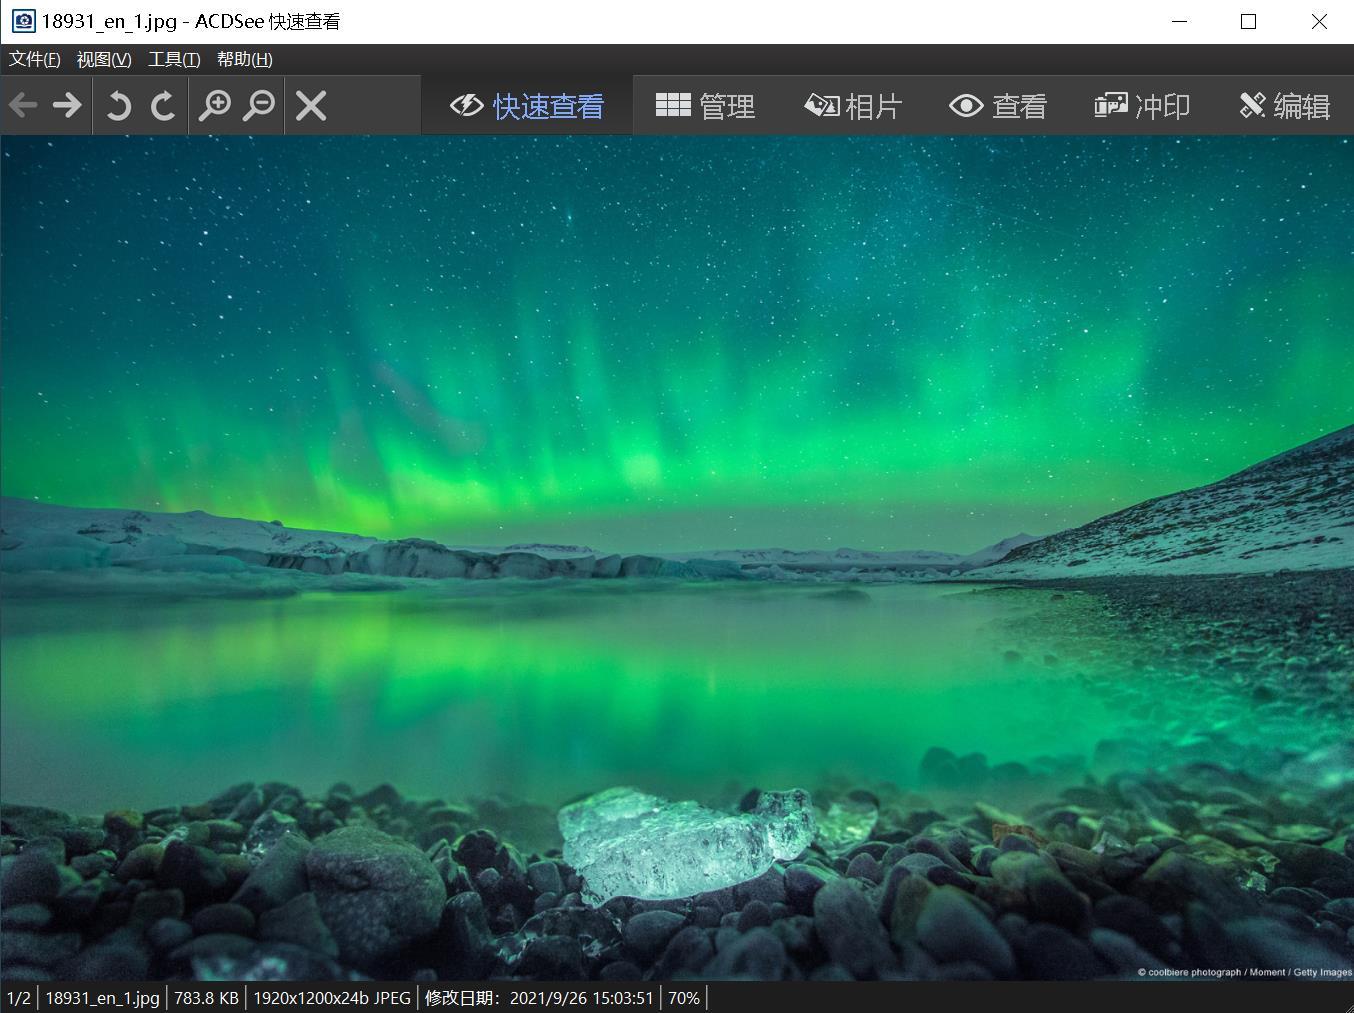 ACDSee Photo Studio Ultimate/Professional 2022 v15.0